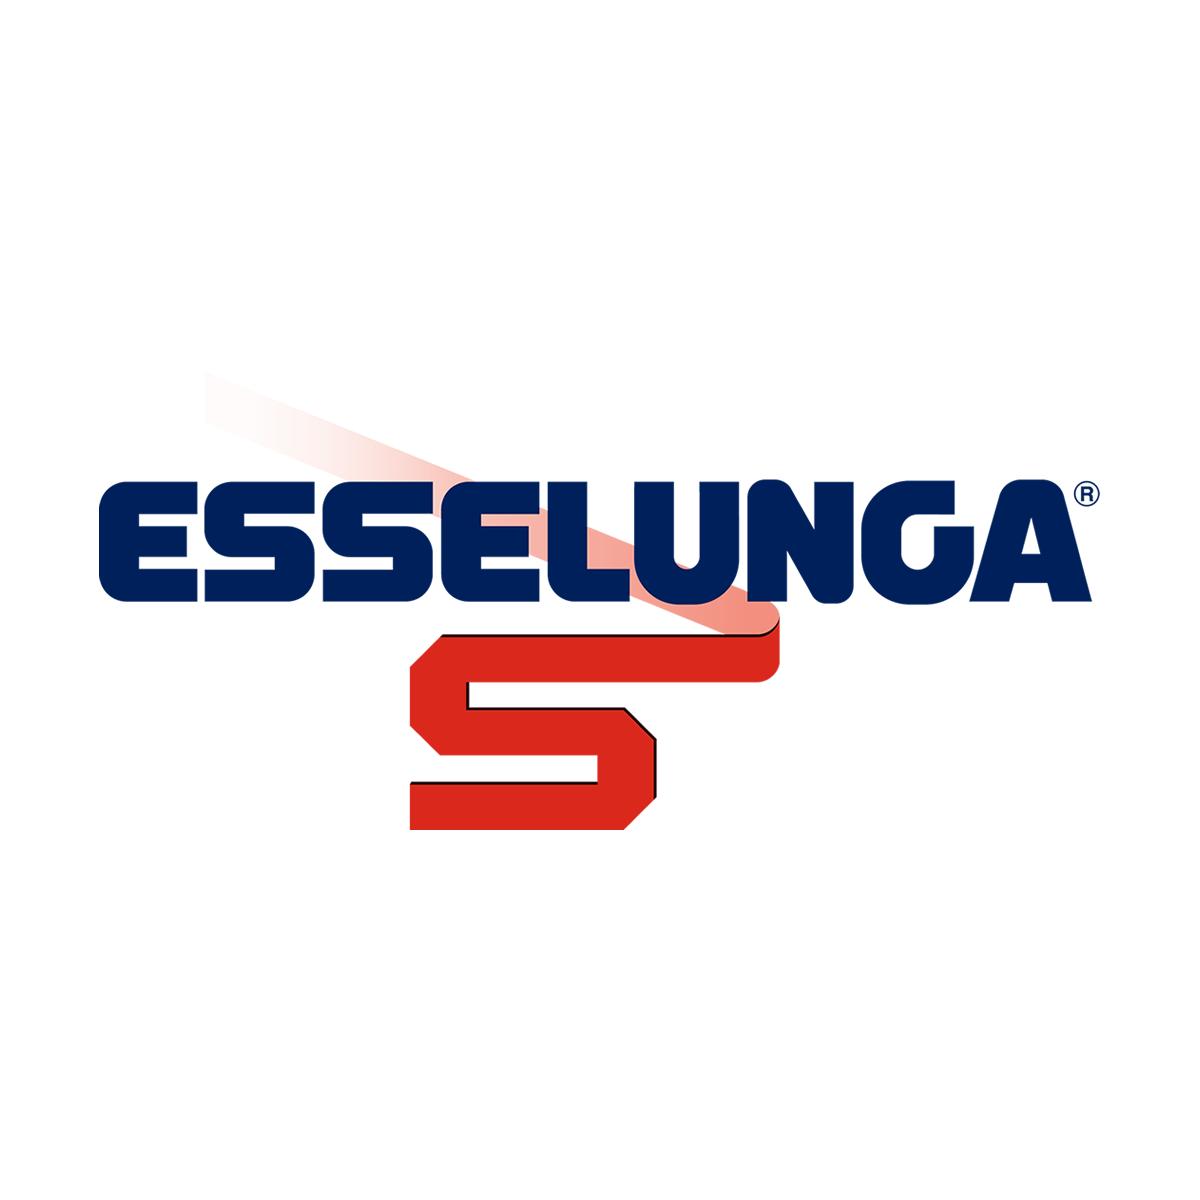 Il reparto frutta e verdura di esselunga esselunga for Esselunga catalogo 2017